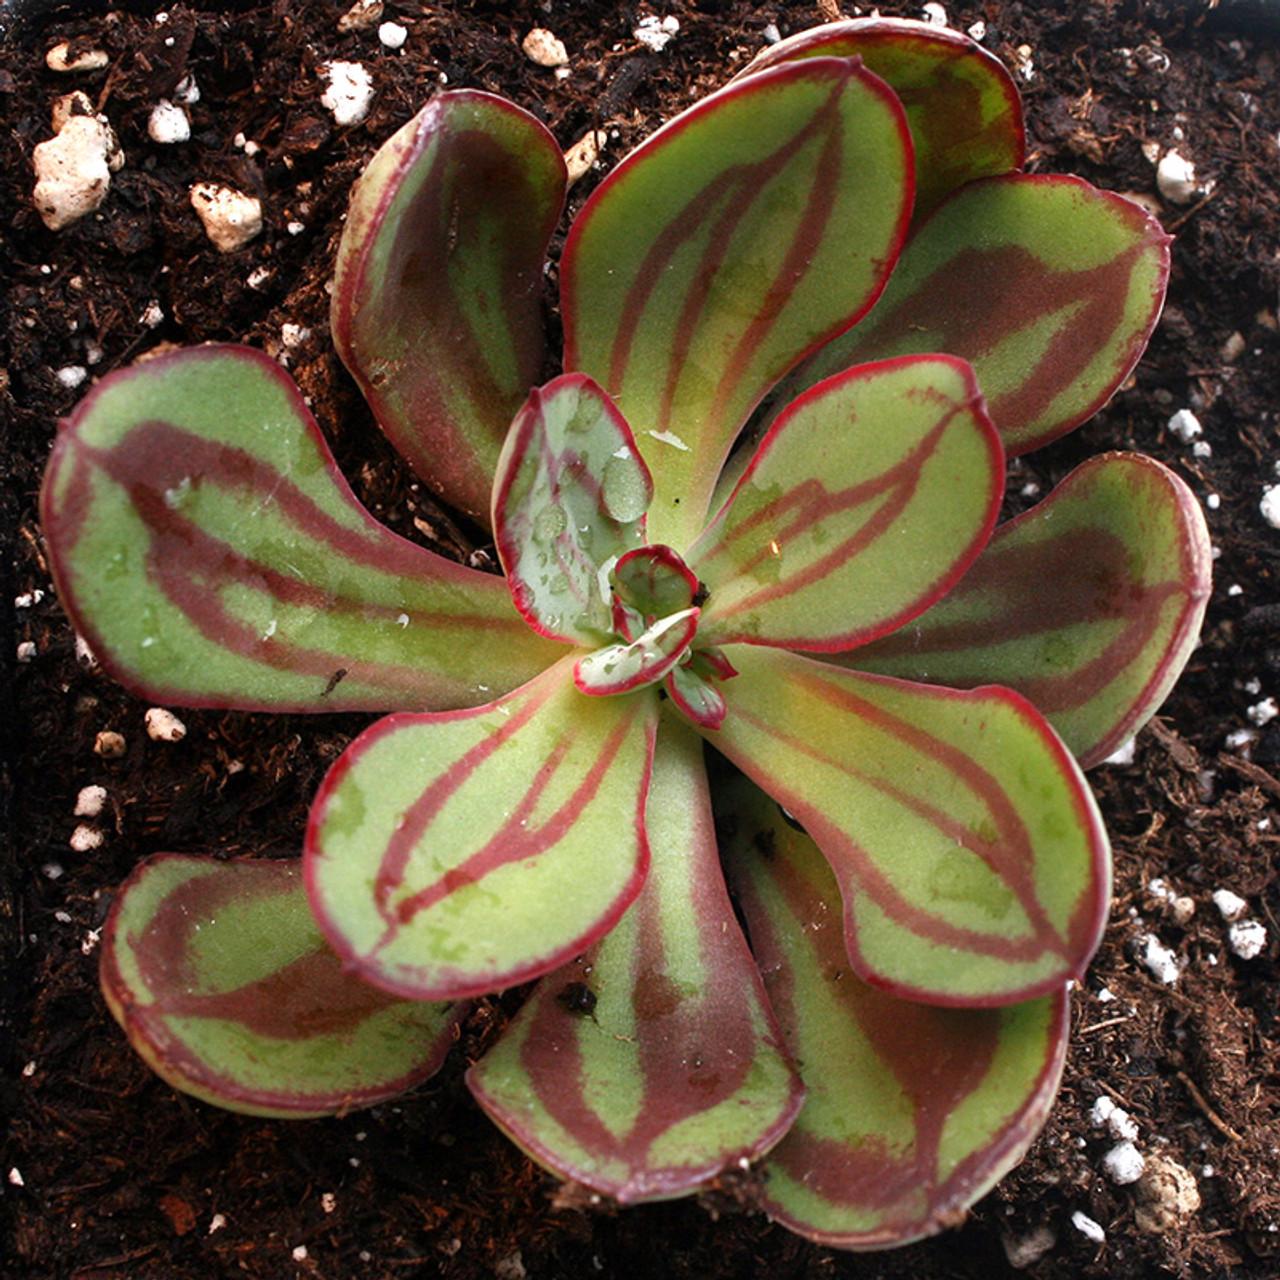 Echeveria Nodulosa Painted Succulents For Sale